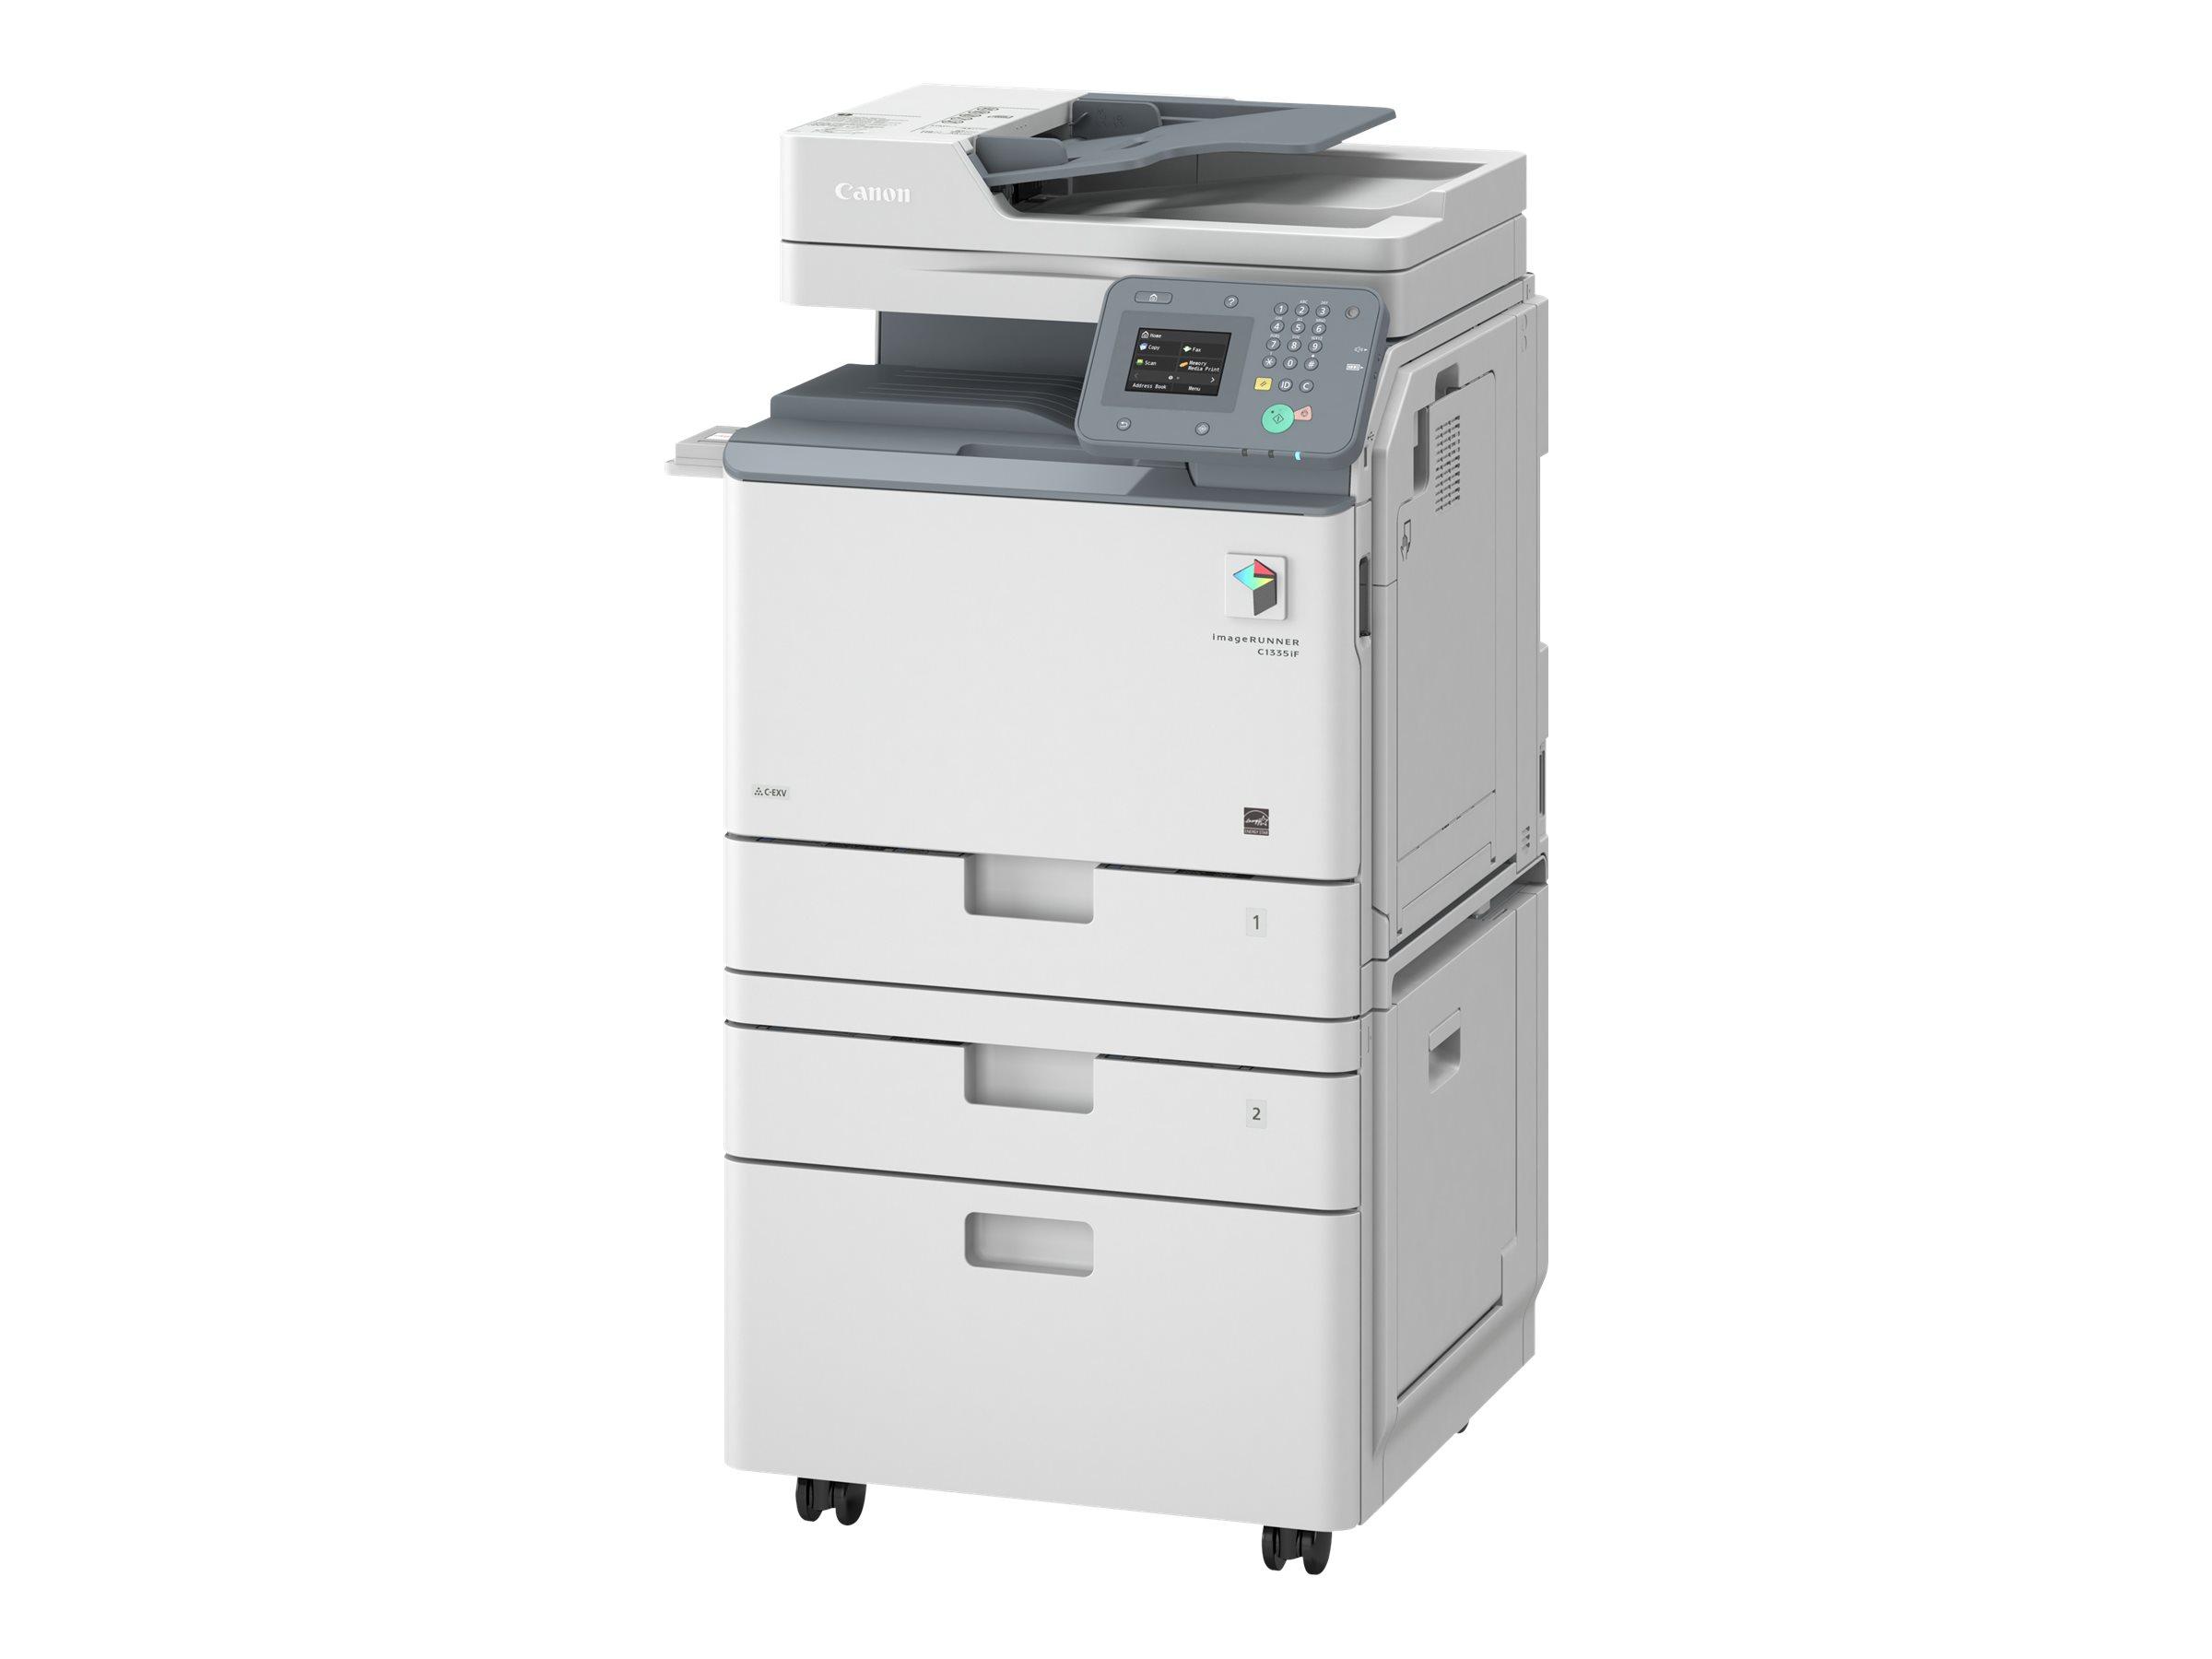 Canon imageRUNNER C1325iF - Multifunktionsdrucker